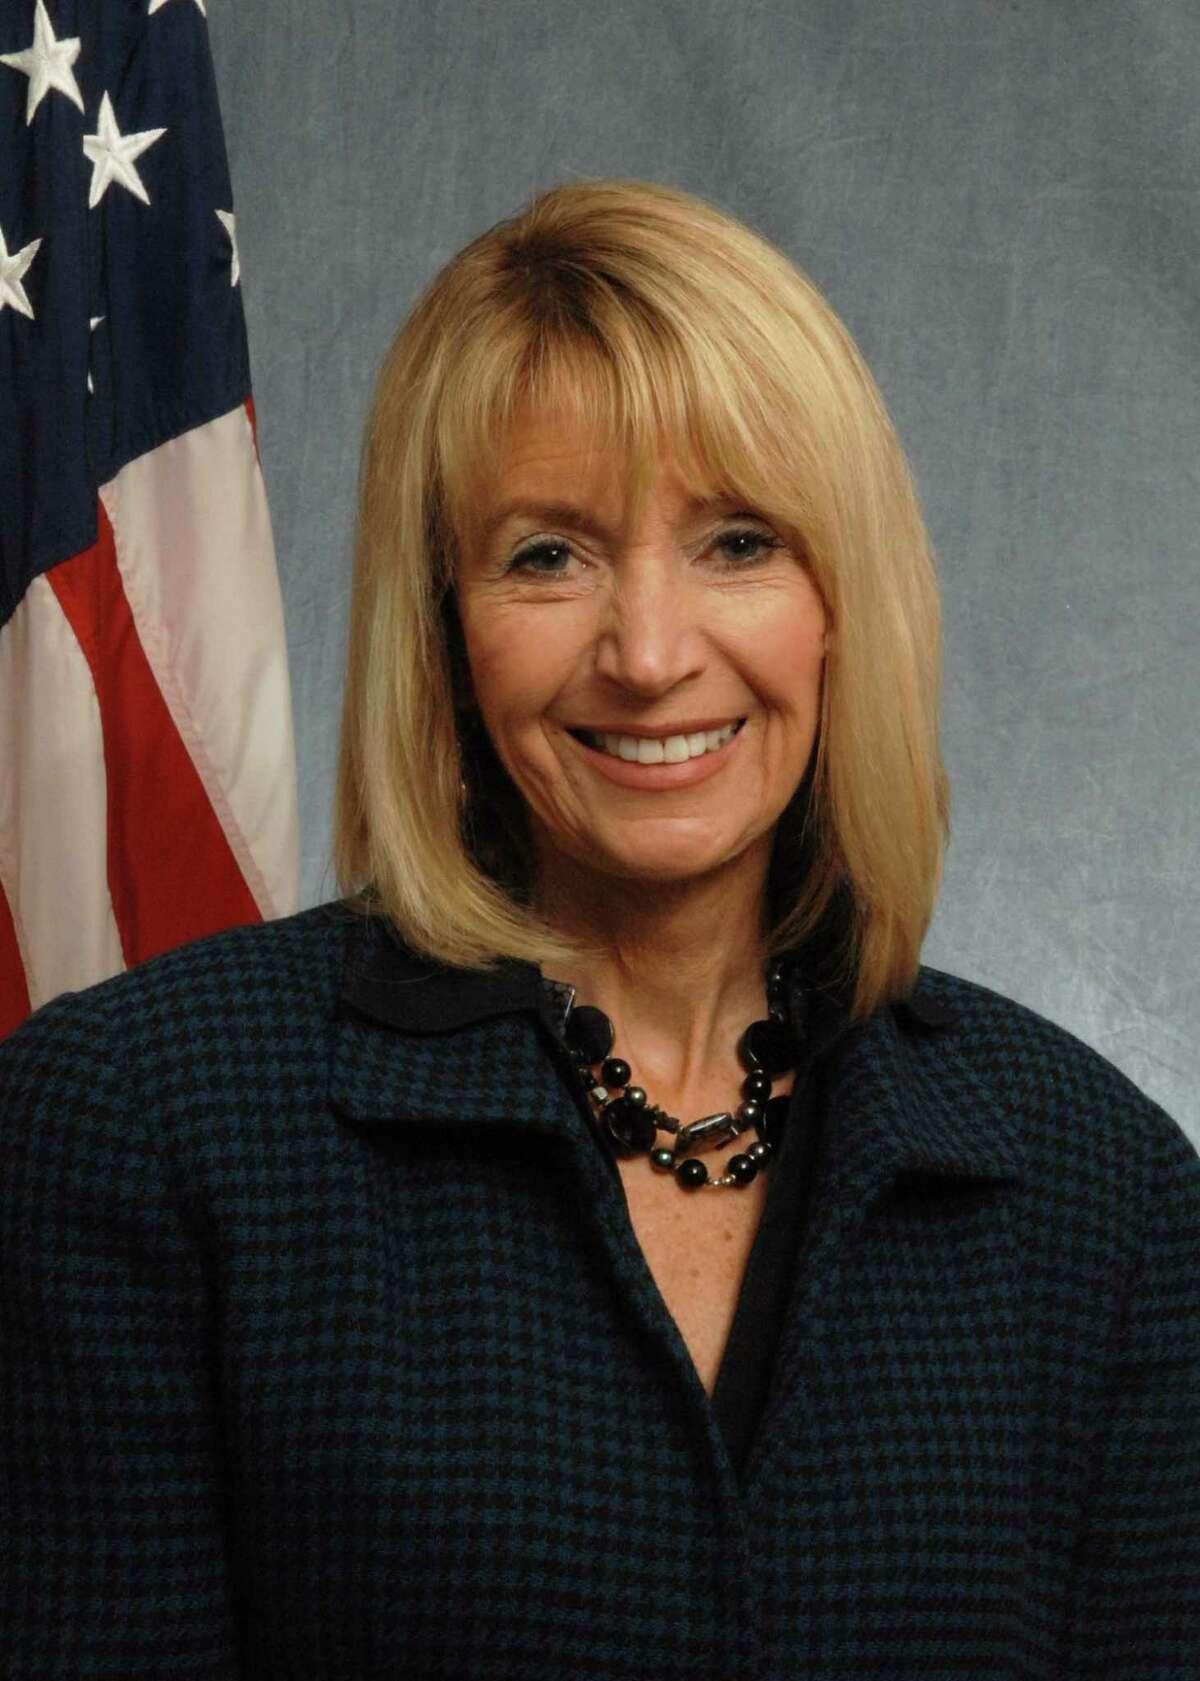 Marcia McNutt, director of U.S. Geological Survey